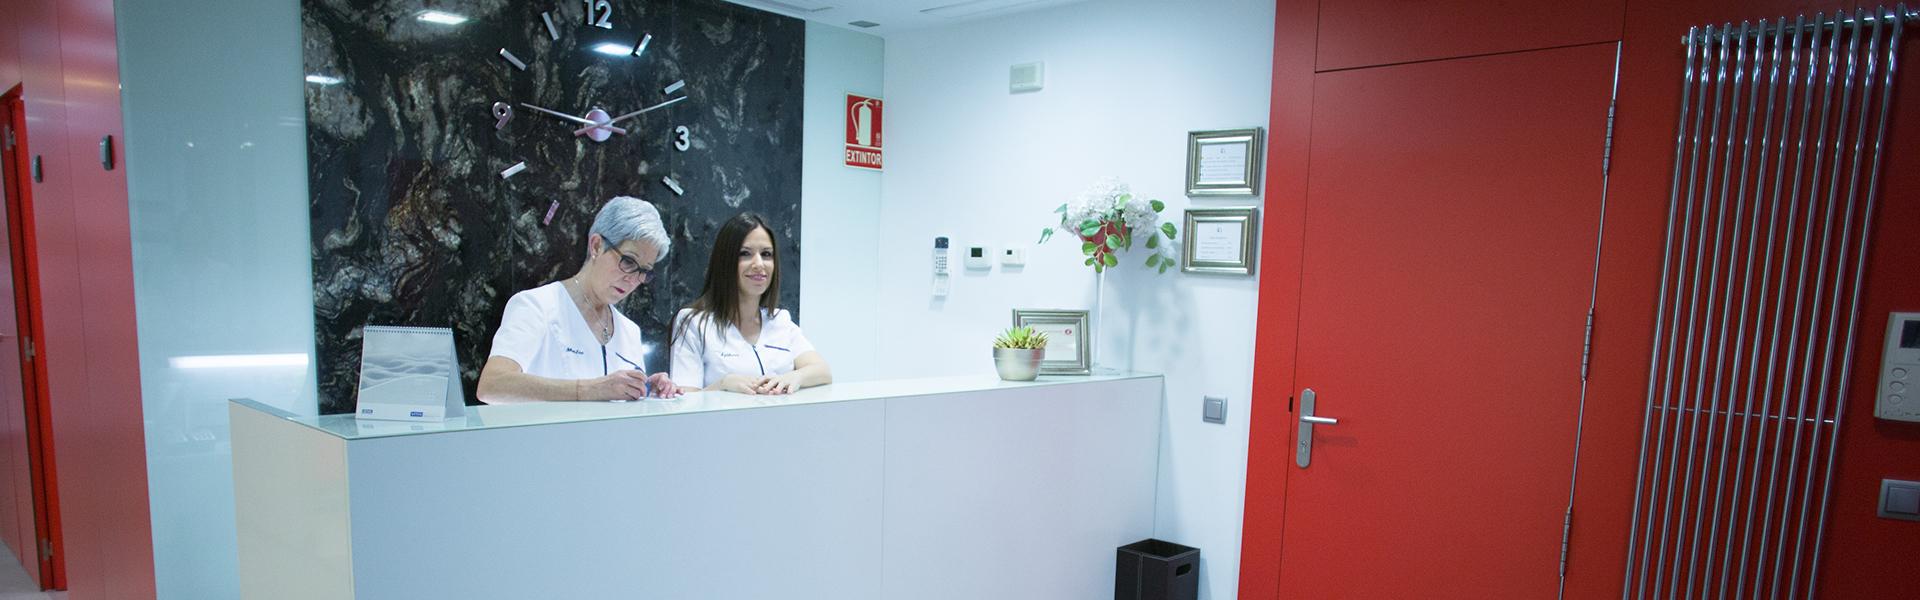 Cl nica dental garc a l pez dental medical group - Clinica dental castellana ...